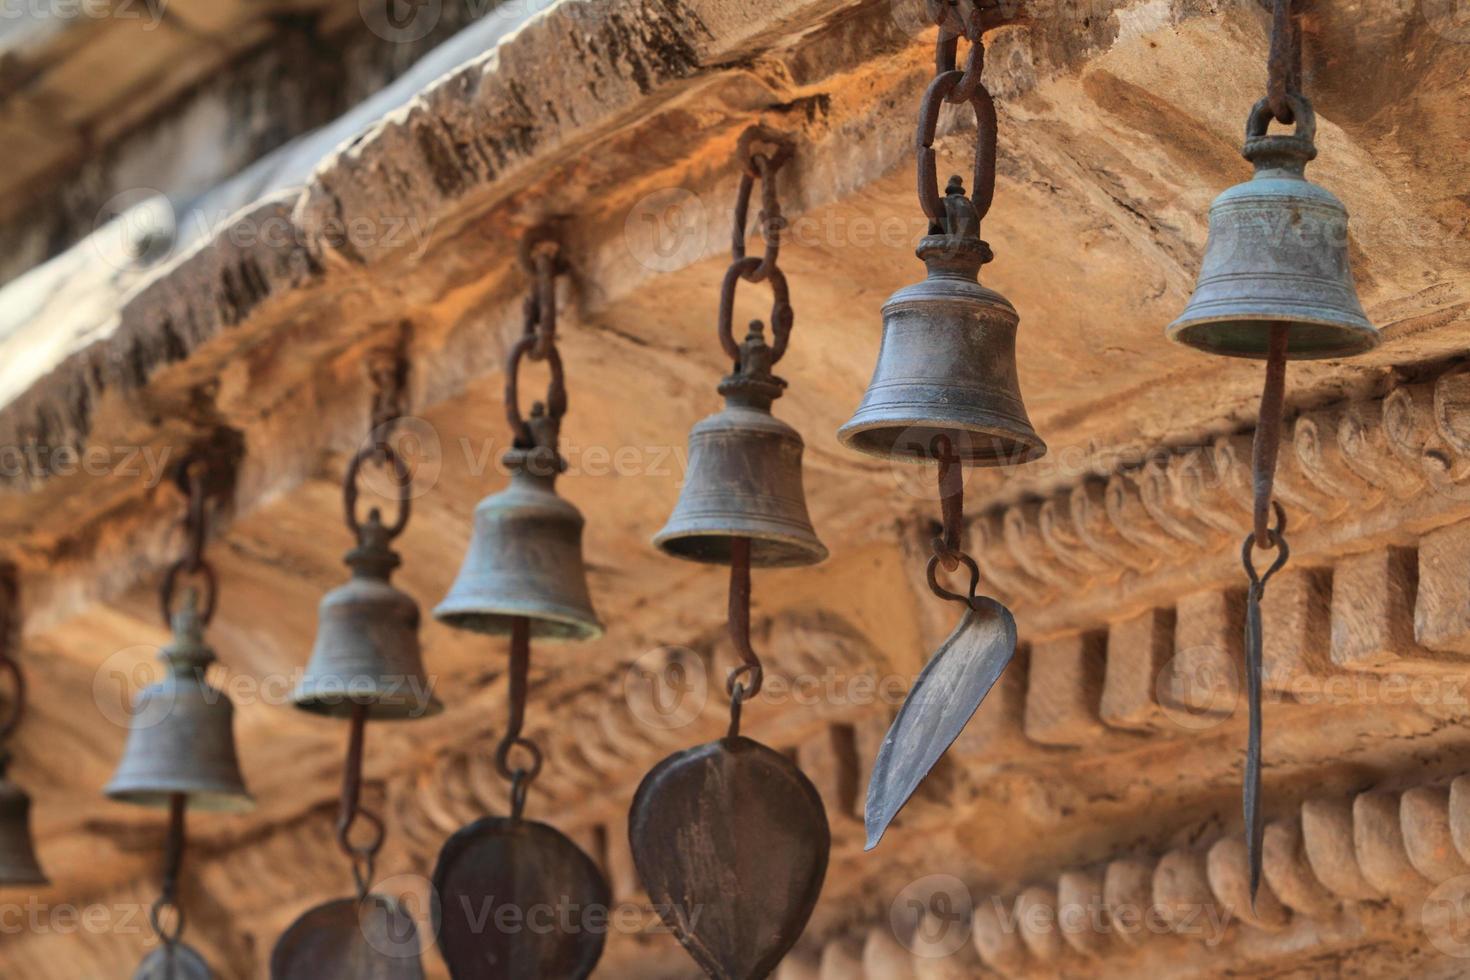 Glocken photo